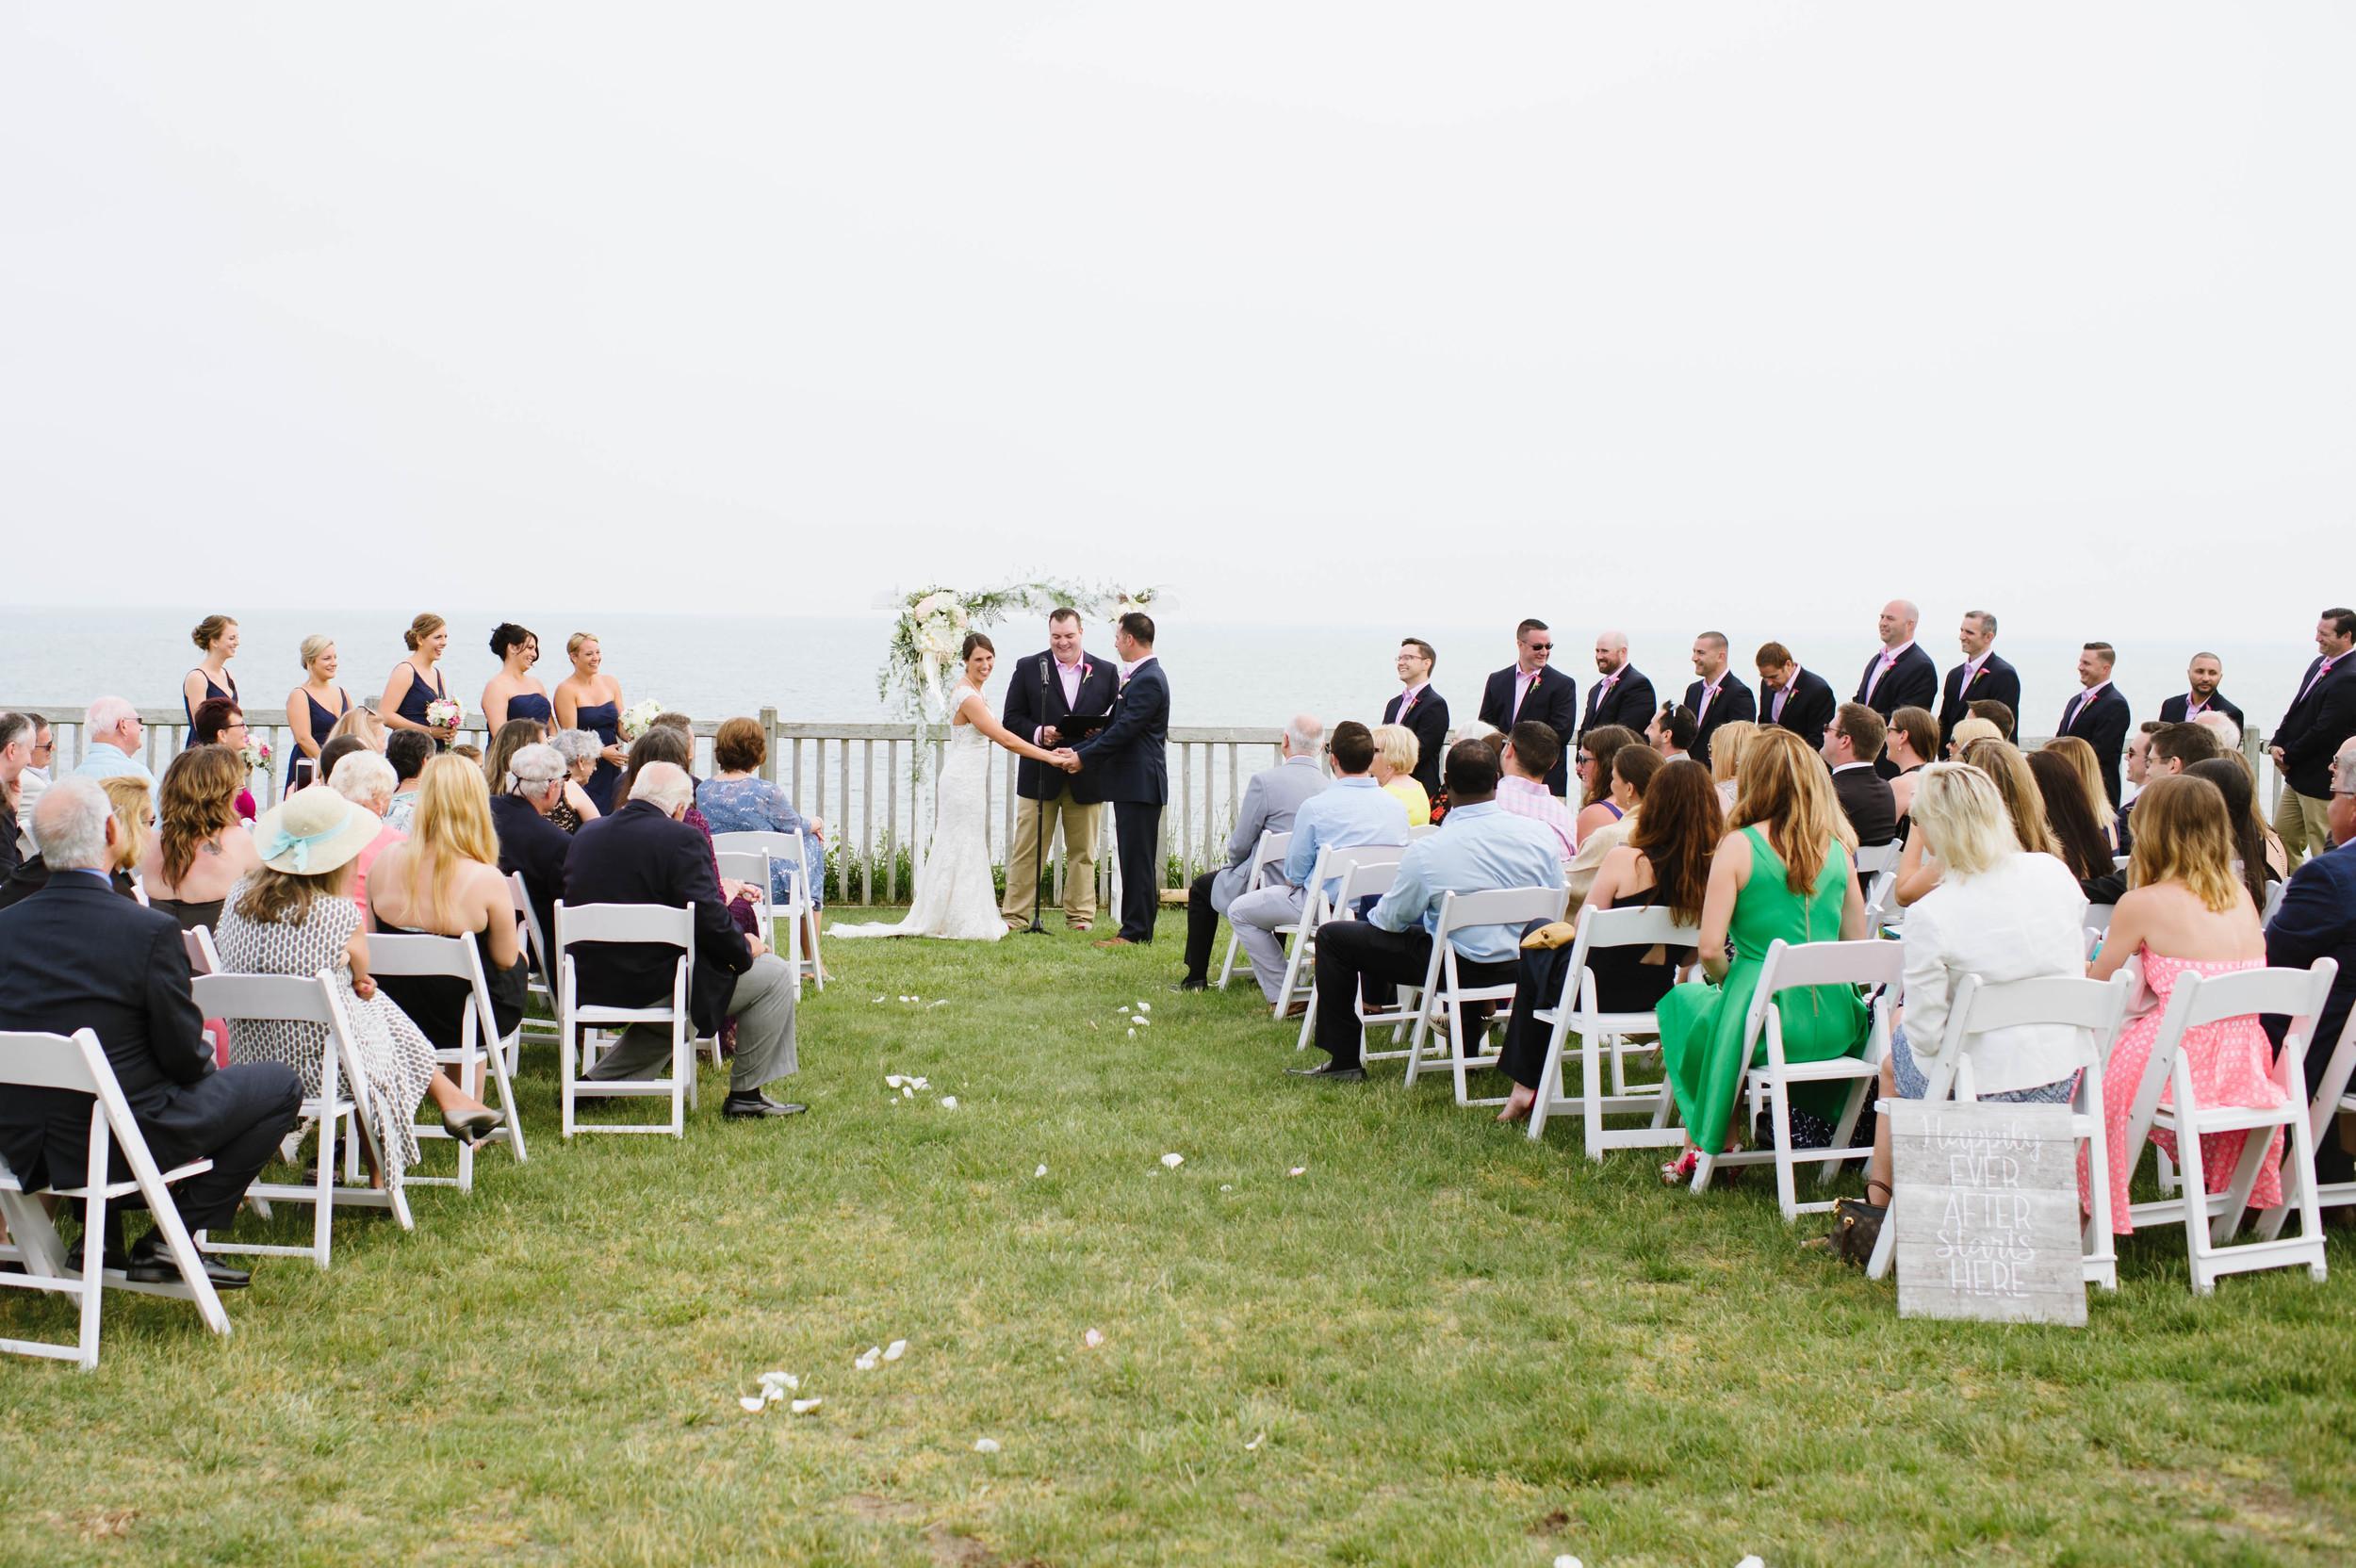 Pelham_House_Wedding_Cape_Cod012.jpg